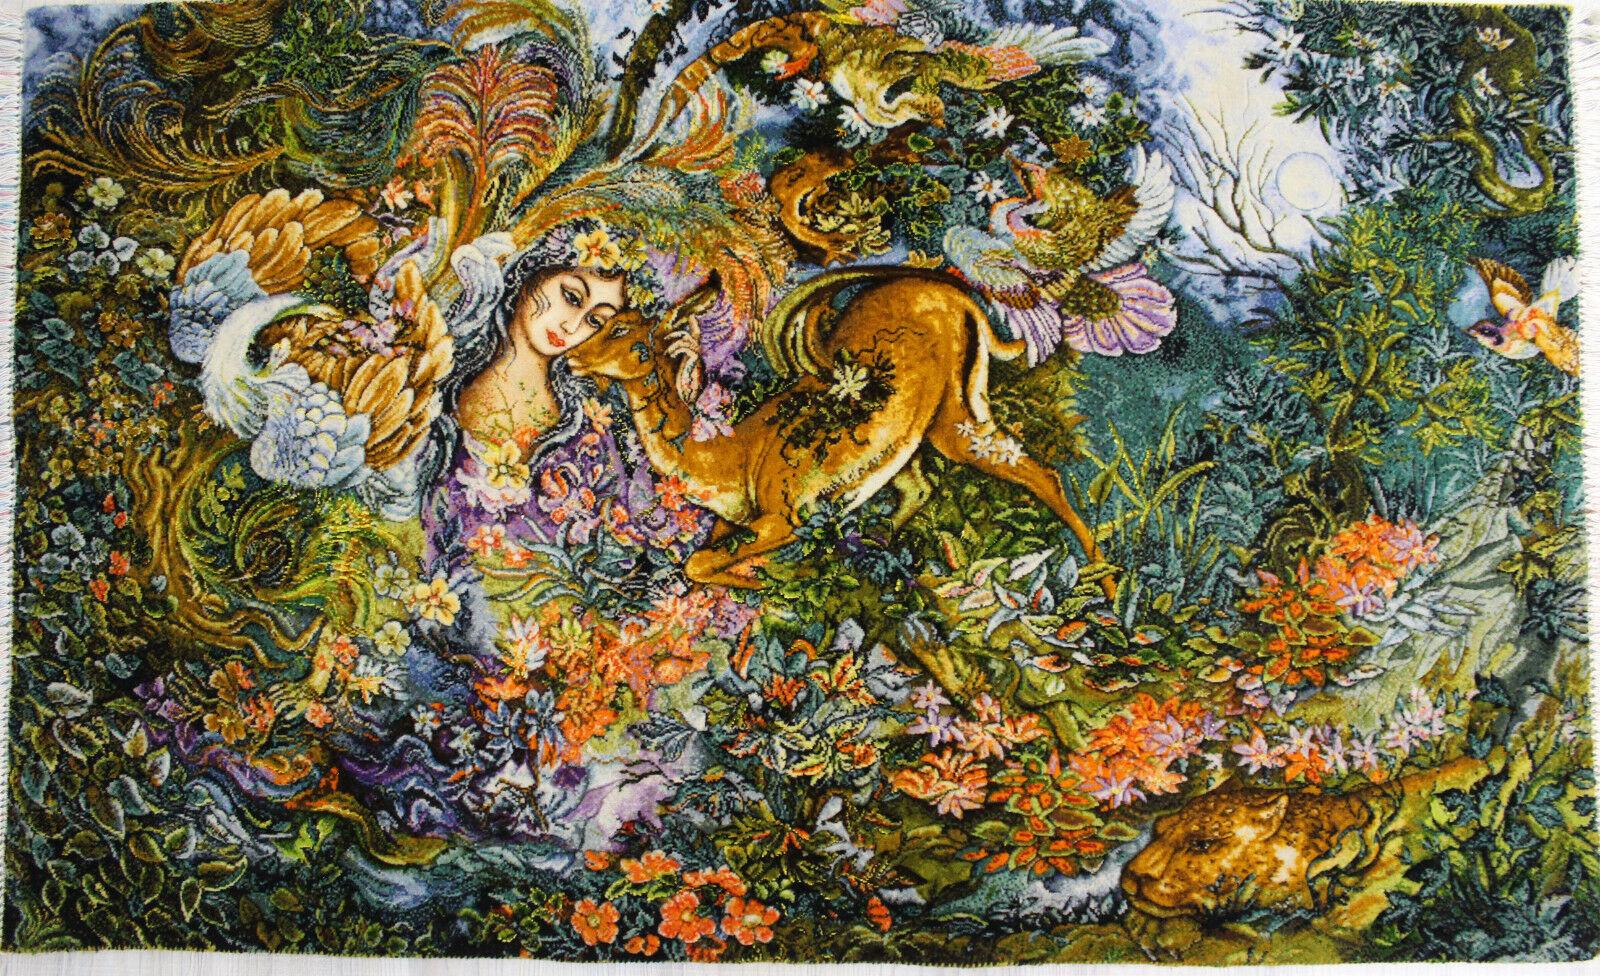 4'11W x 3'H Handmade Wool and Silk FARSH MINIATOR Persian Tableau Rug Tapestry Wall Hanging 12980831 (1)